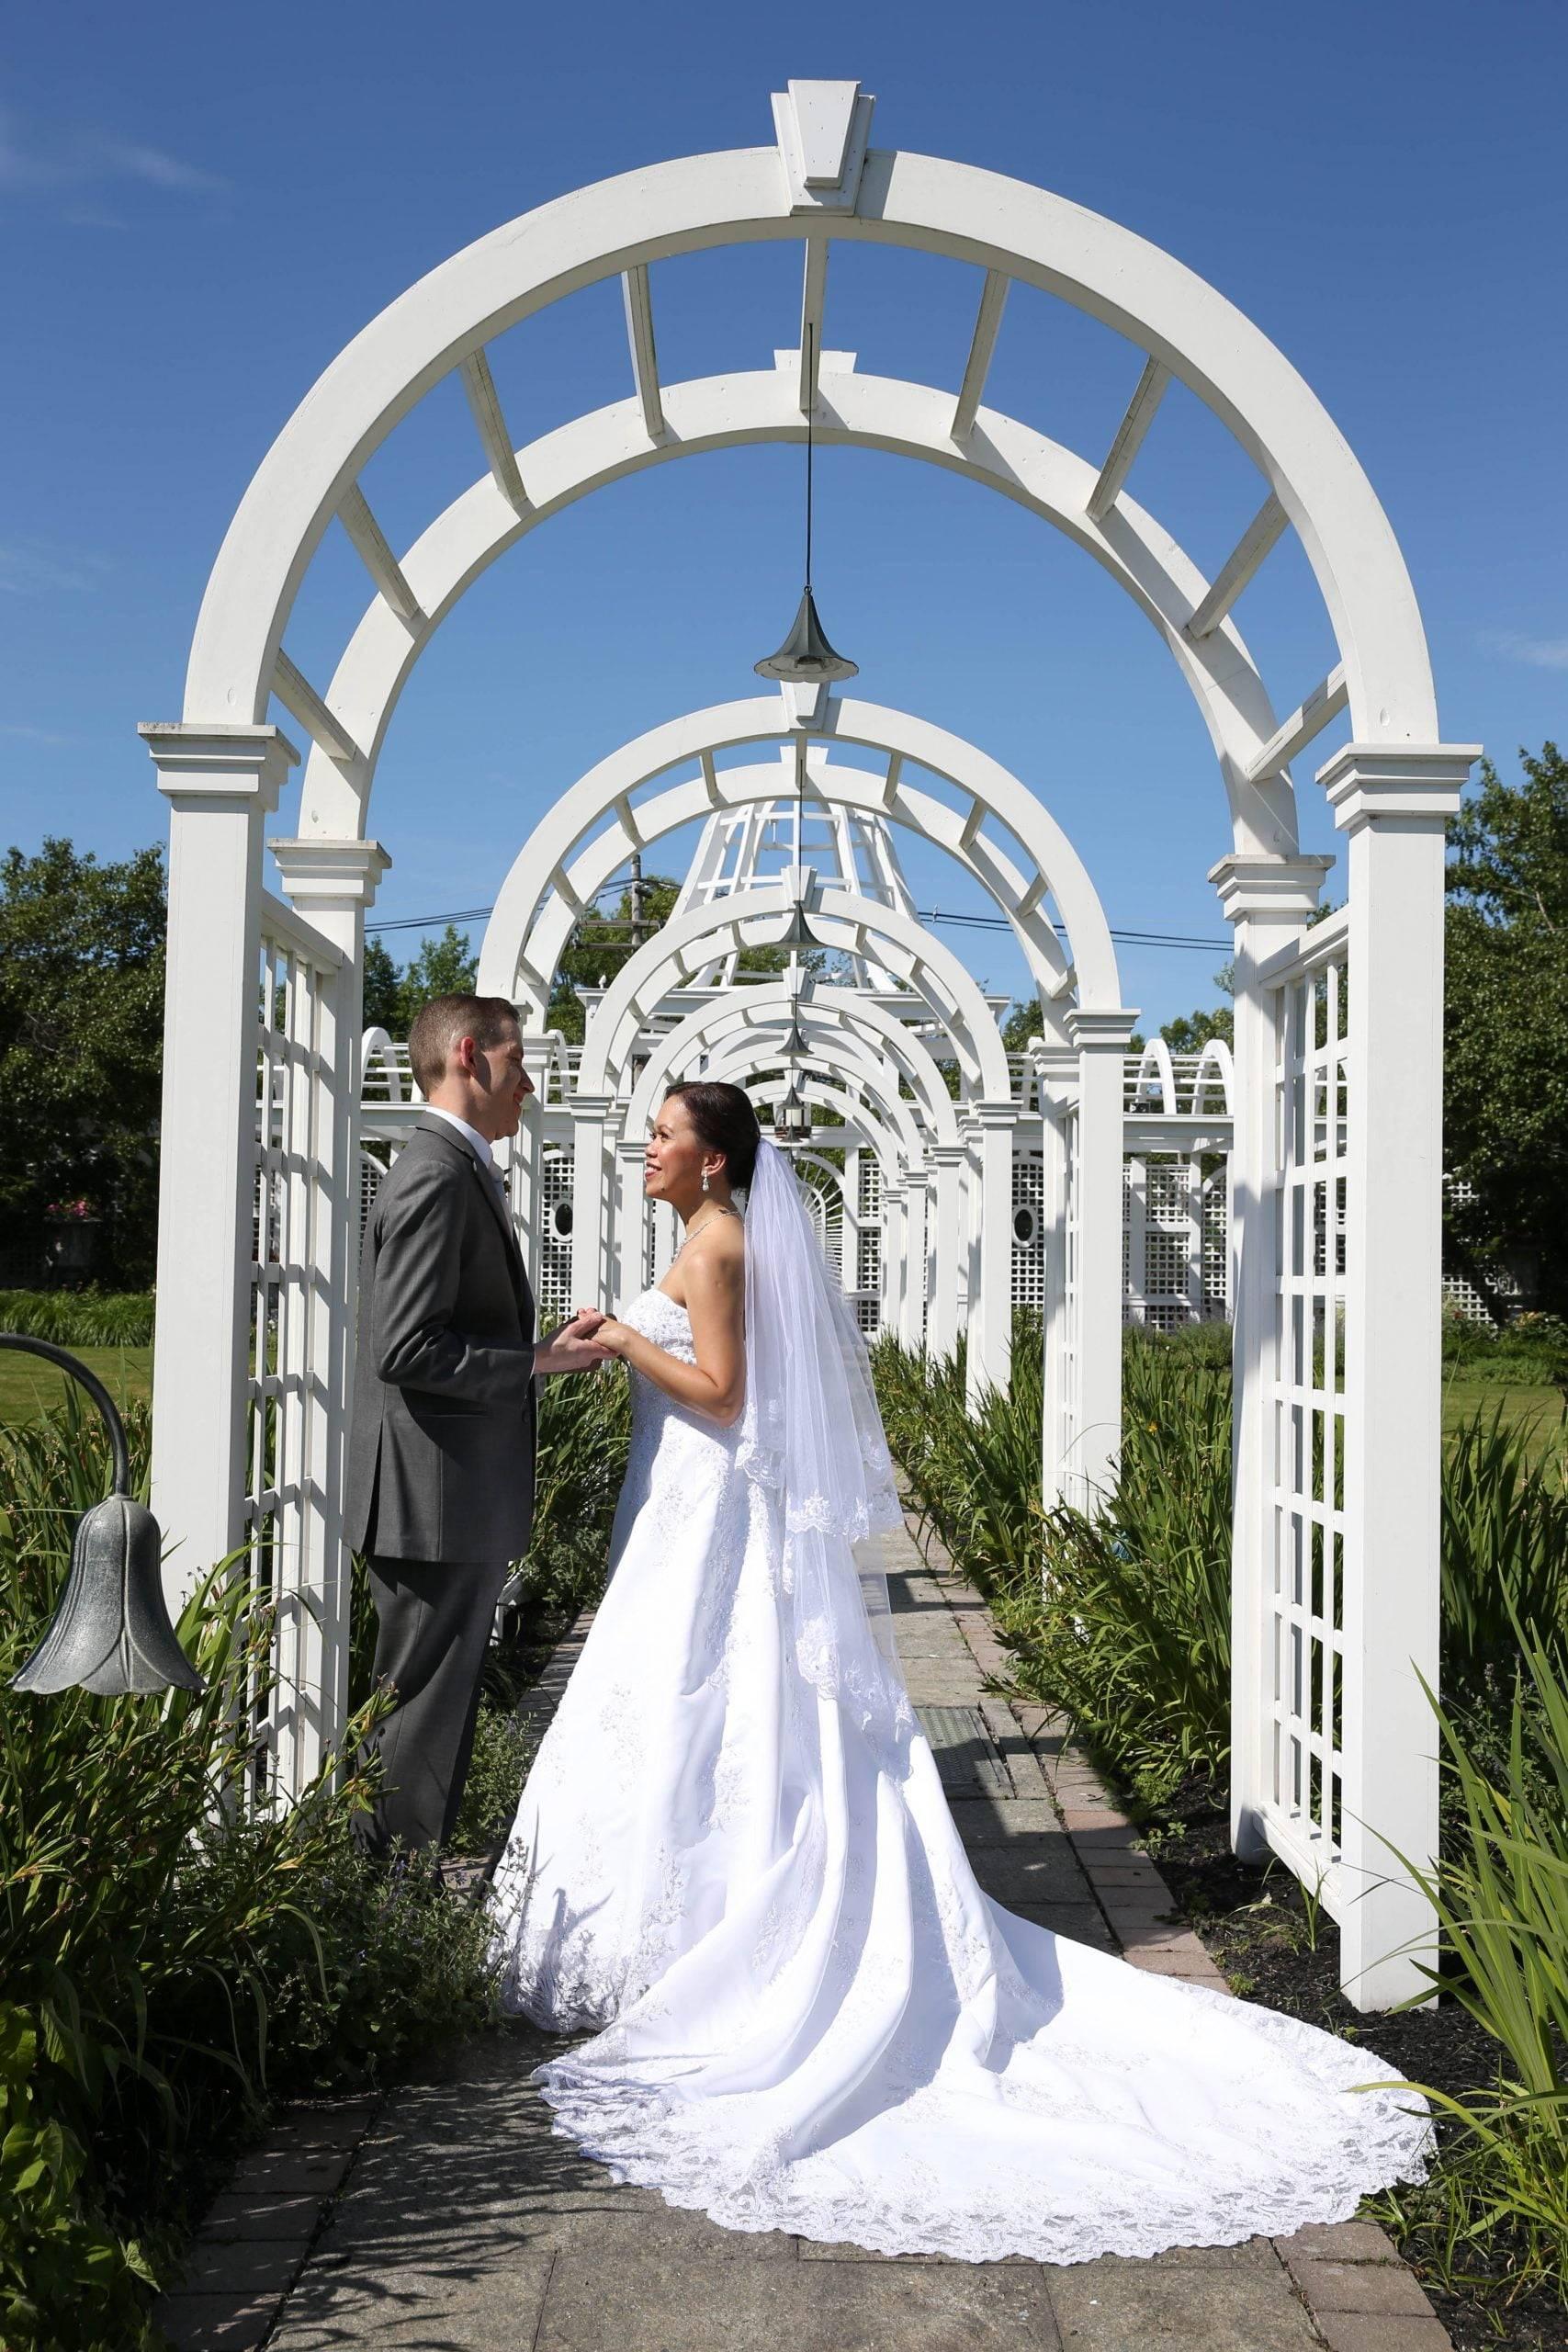 Birchwood Manor bride and groom by arbor